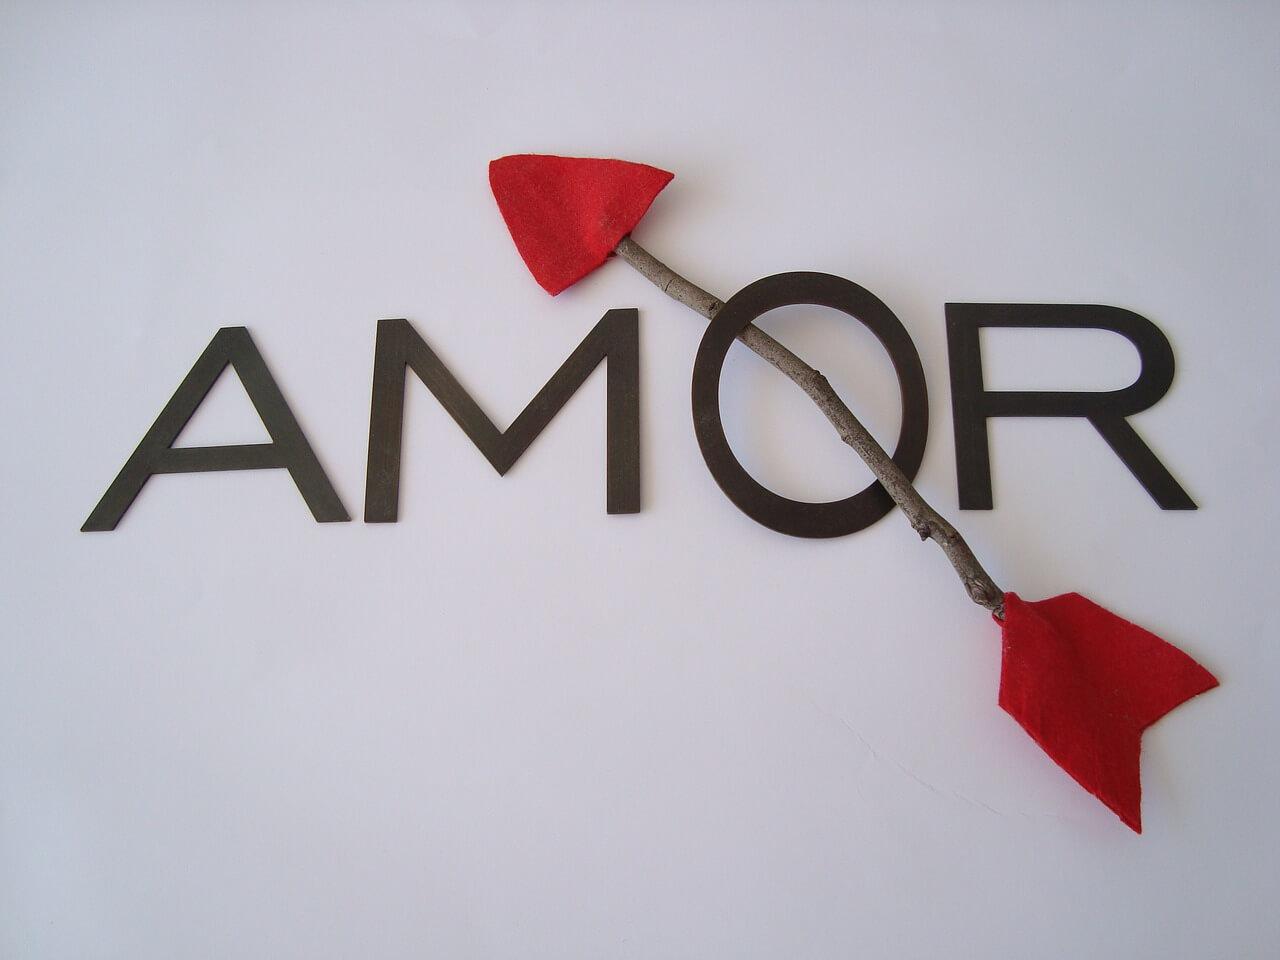 Expresiones amor, vamosaudioblog.com